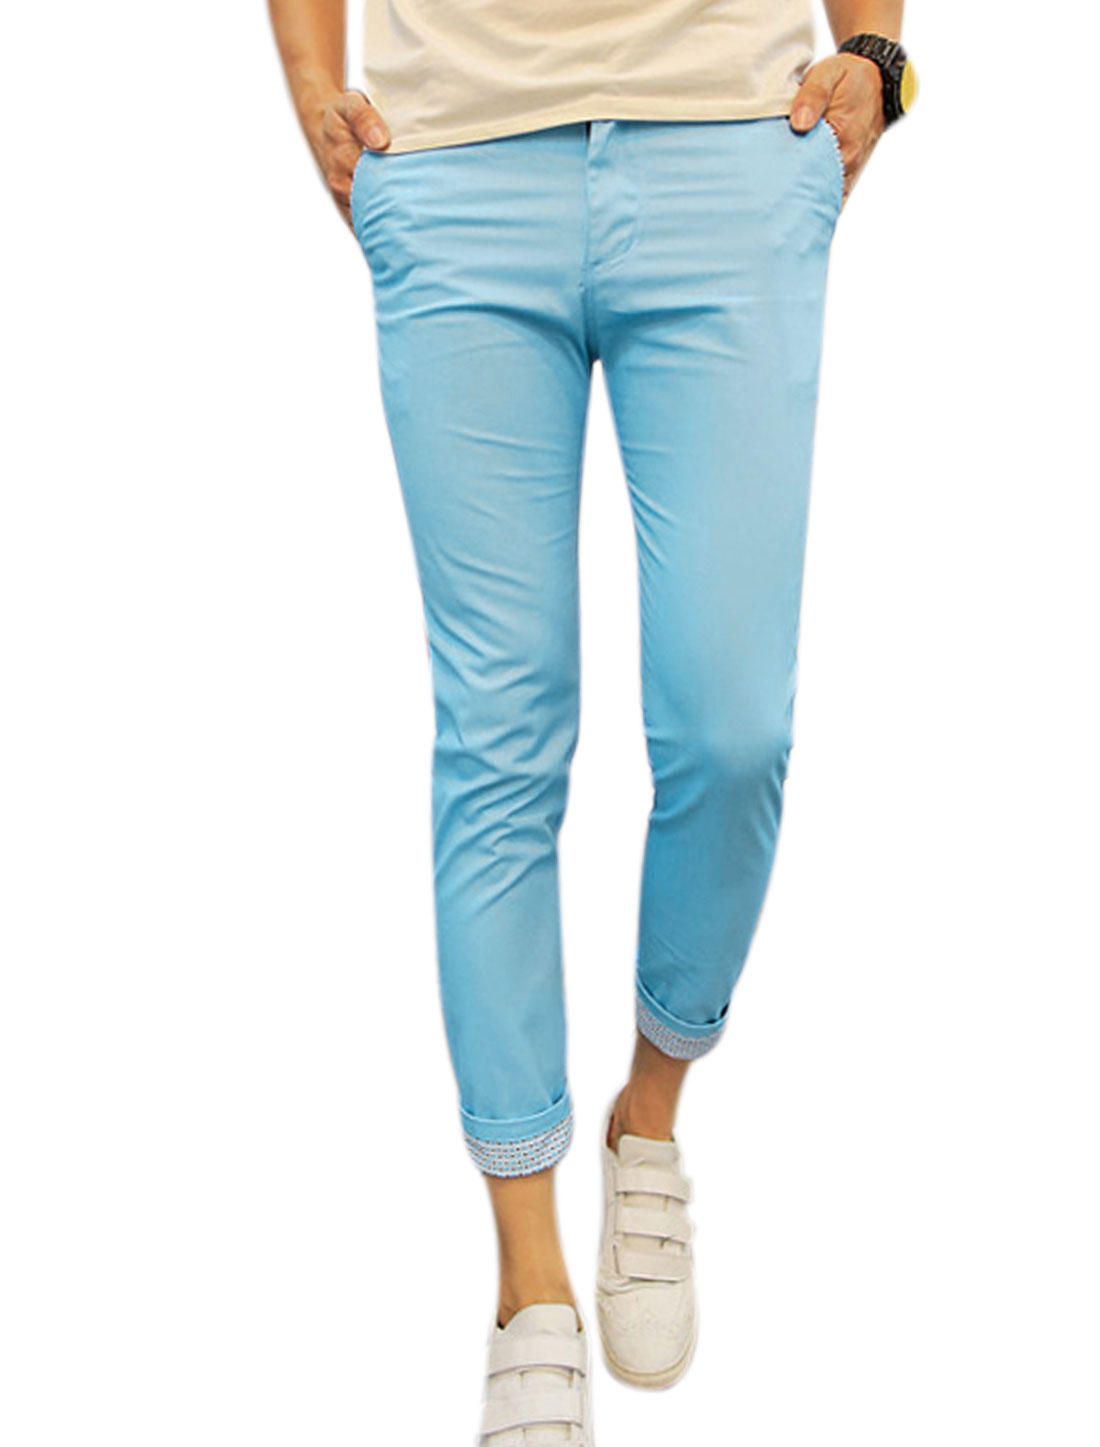 Men Mid Waist Pockets Slim Fit Cropped Trousers Sky Blue W28